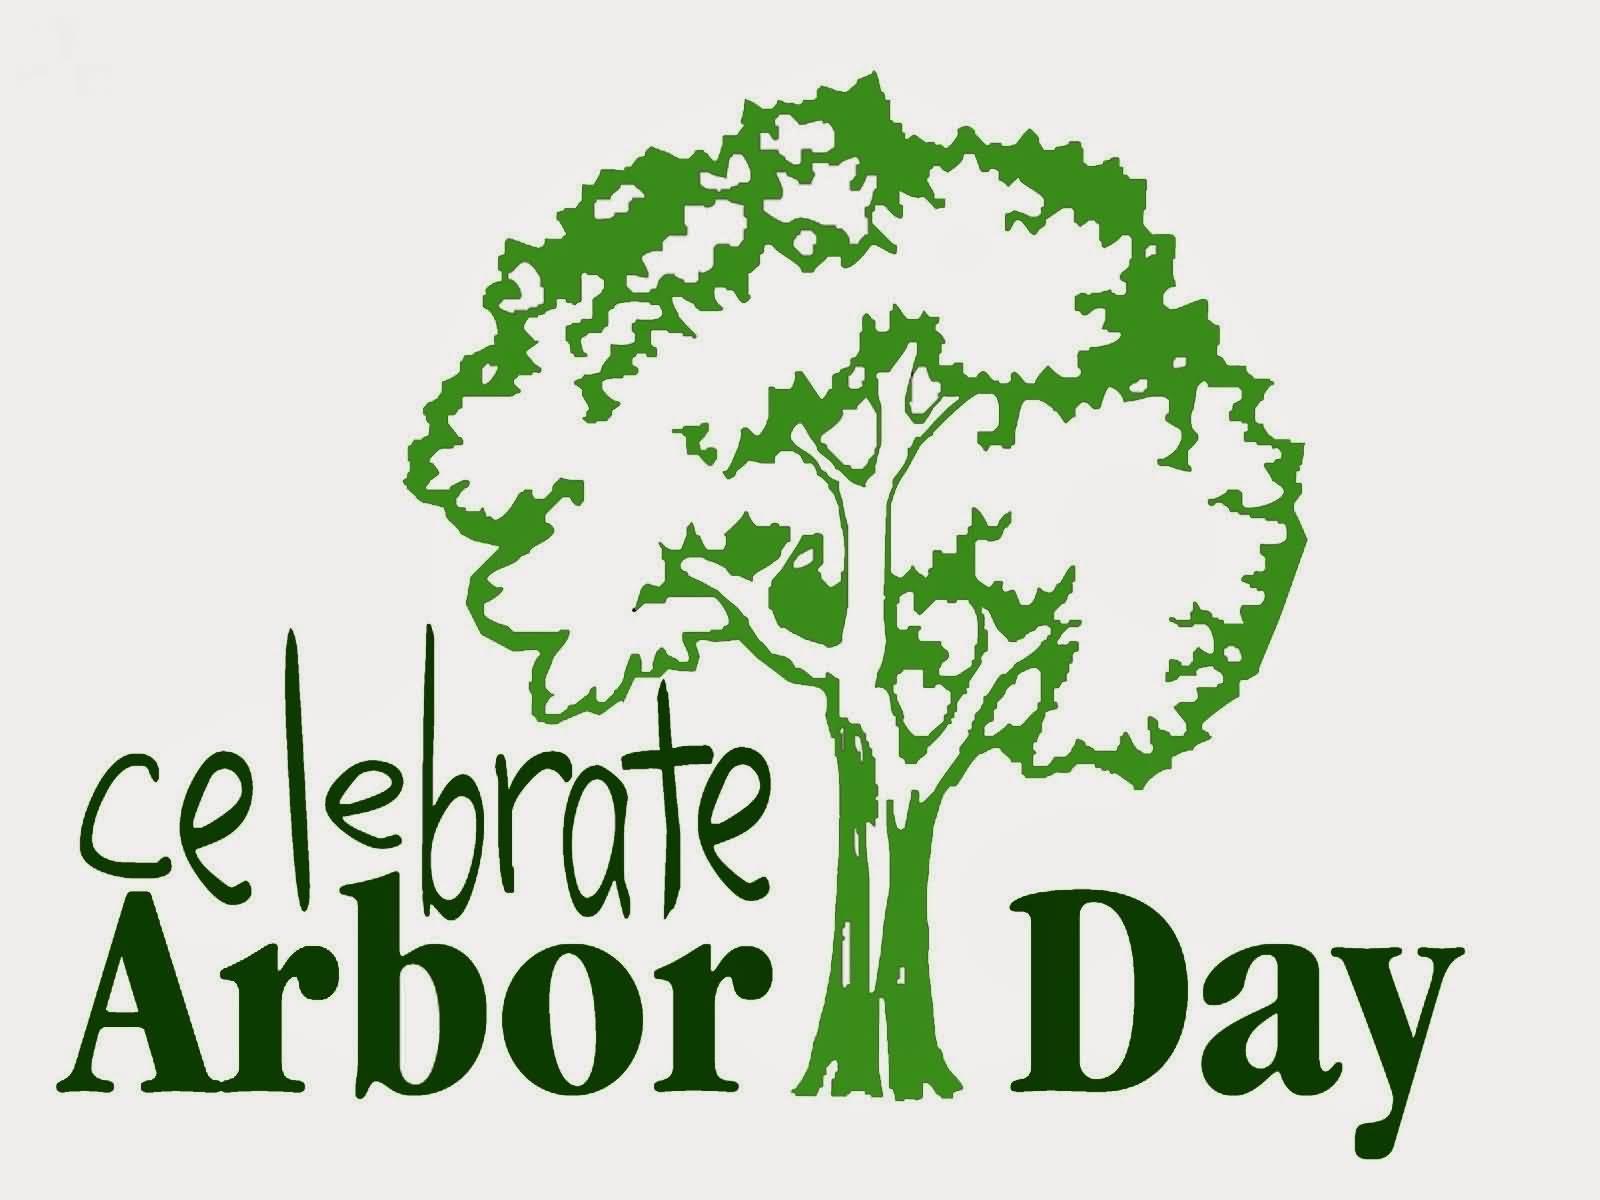 Celebrate-Arbor-Day-Tree-Clipart 3